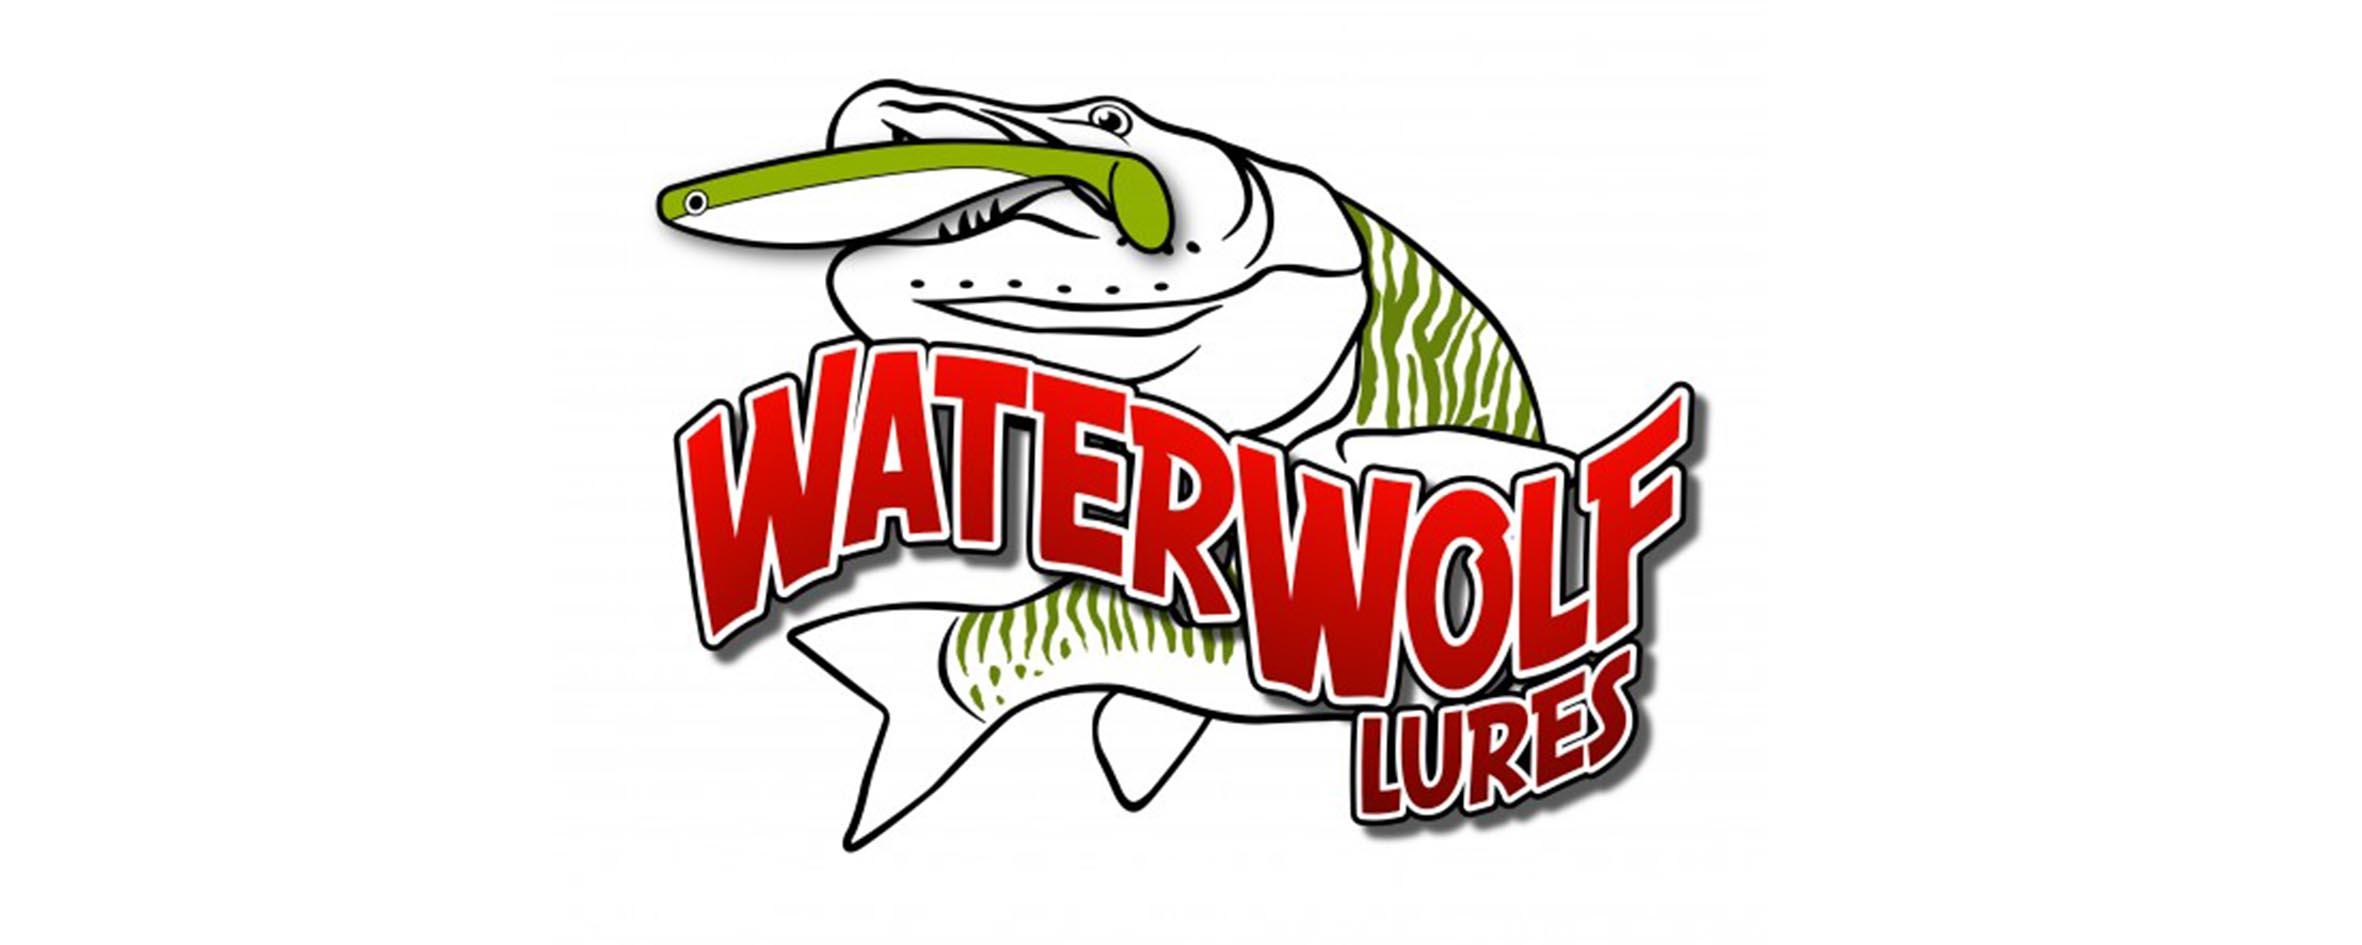 Waterwolf Lures - Shadzilla